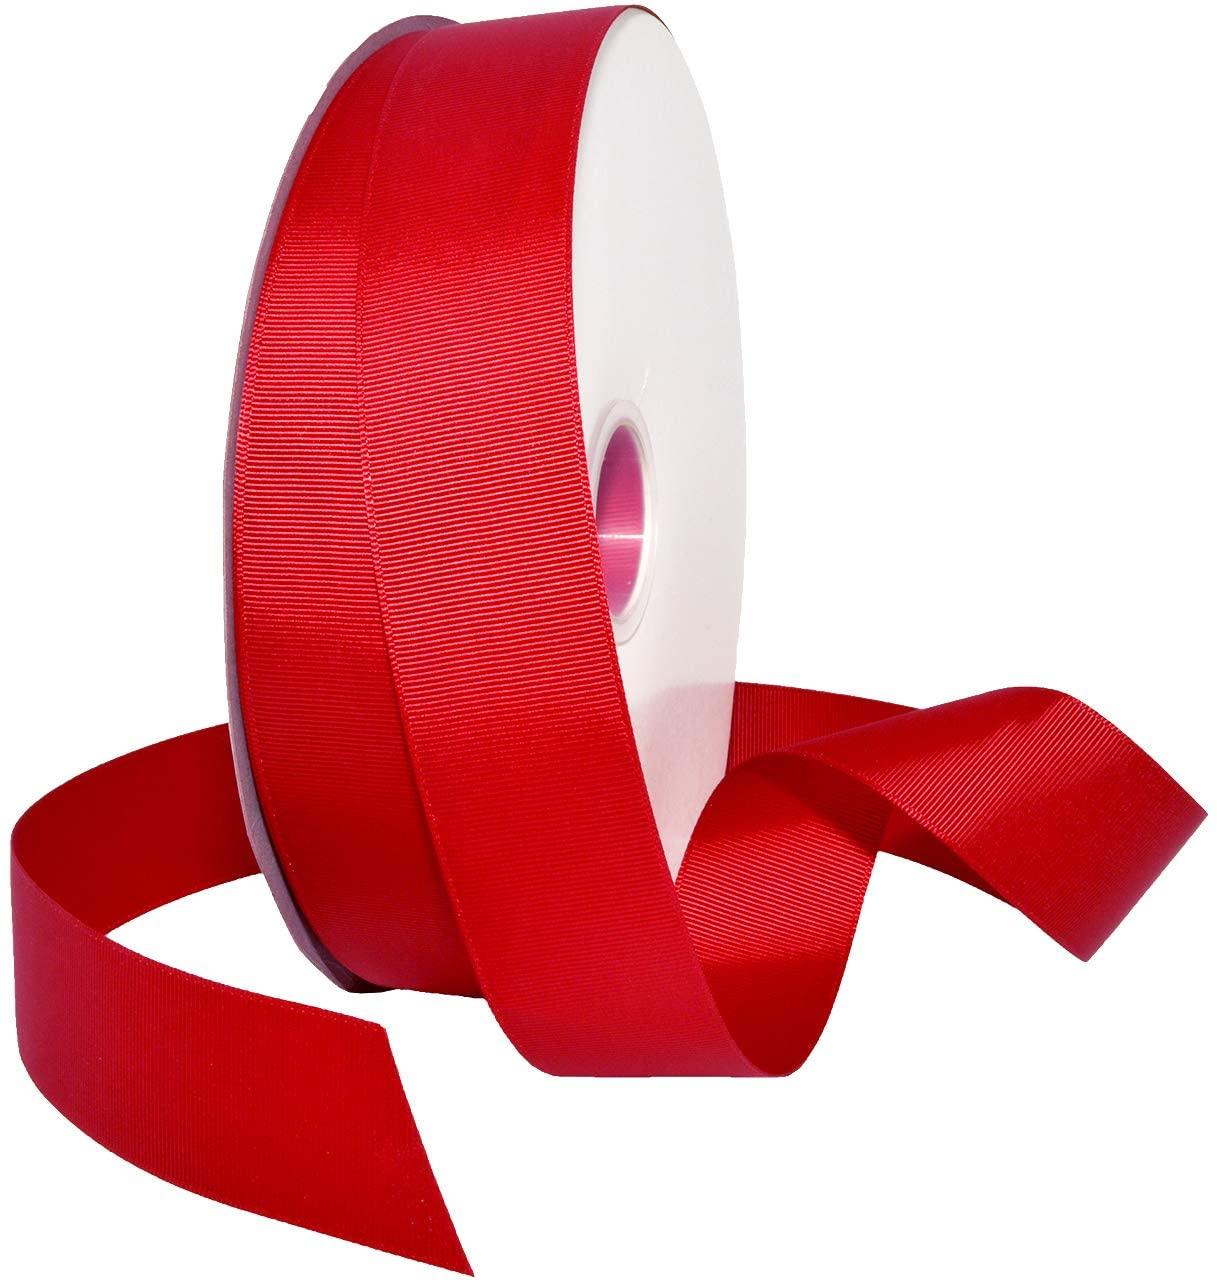 Morex Grosgrain Ribbon Grosgrain Ribbon, Ruby